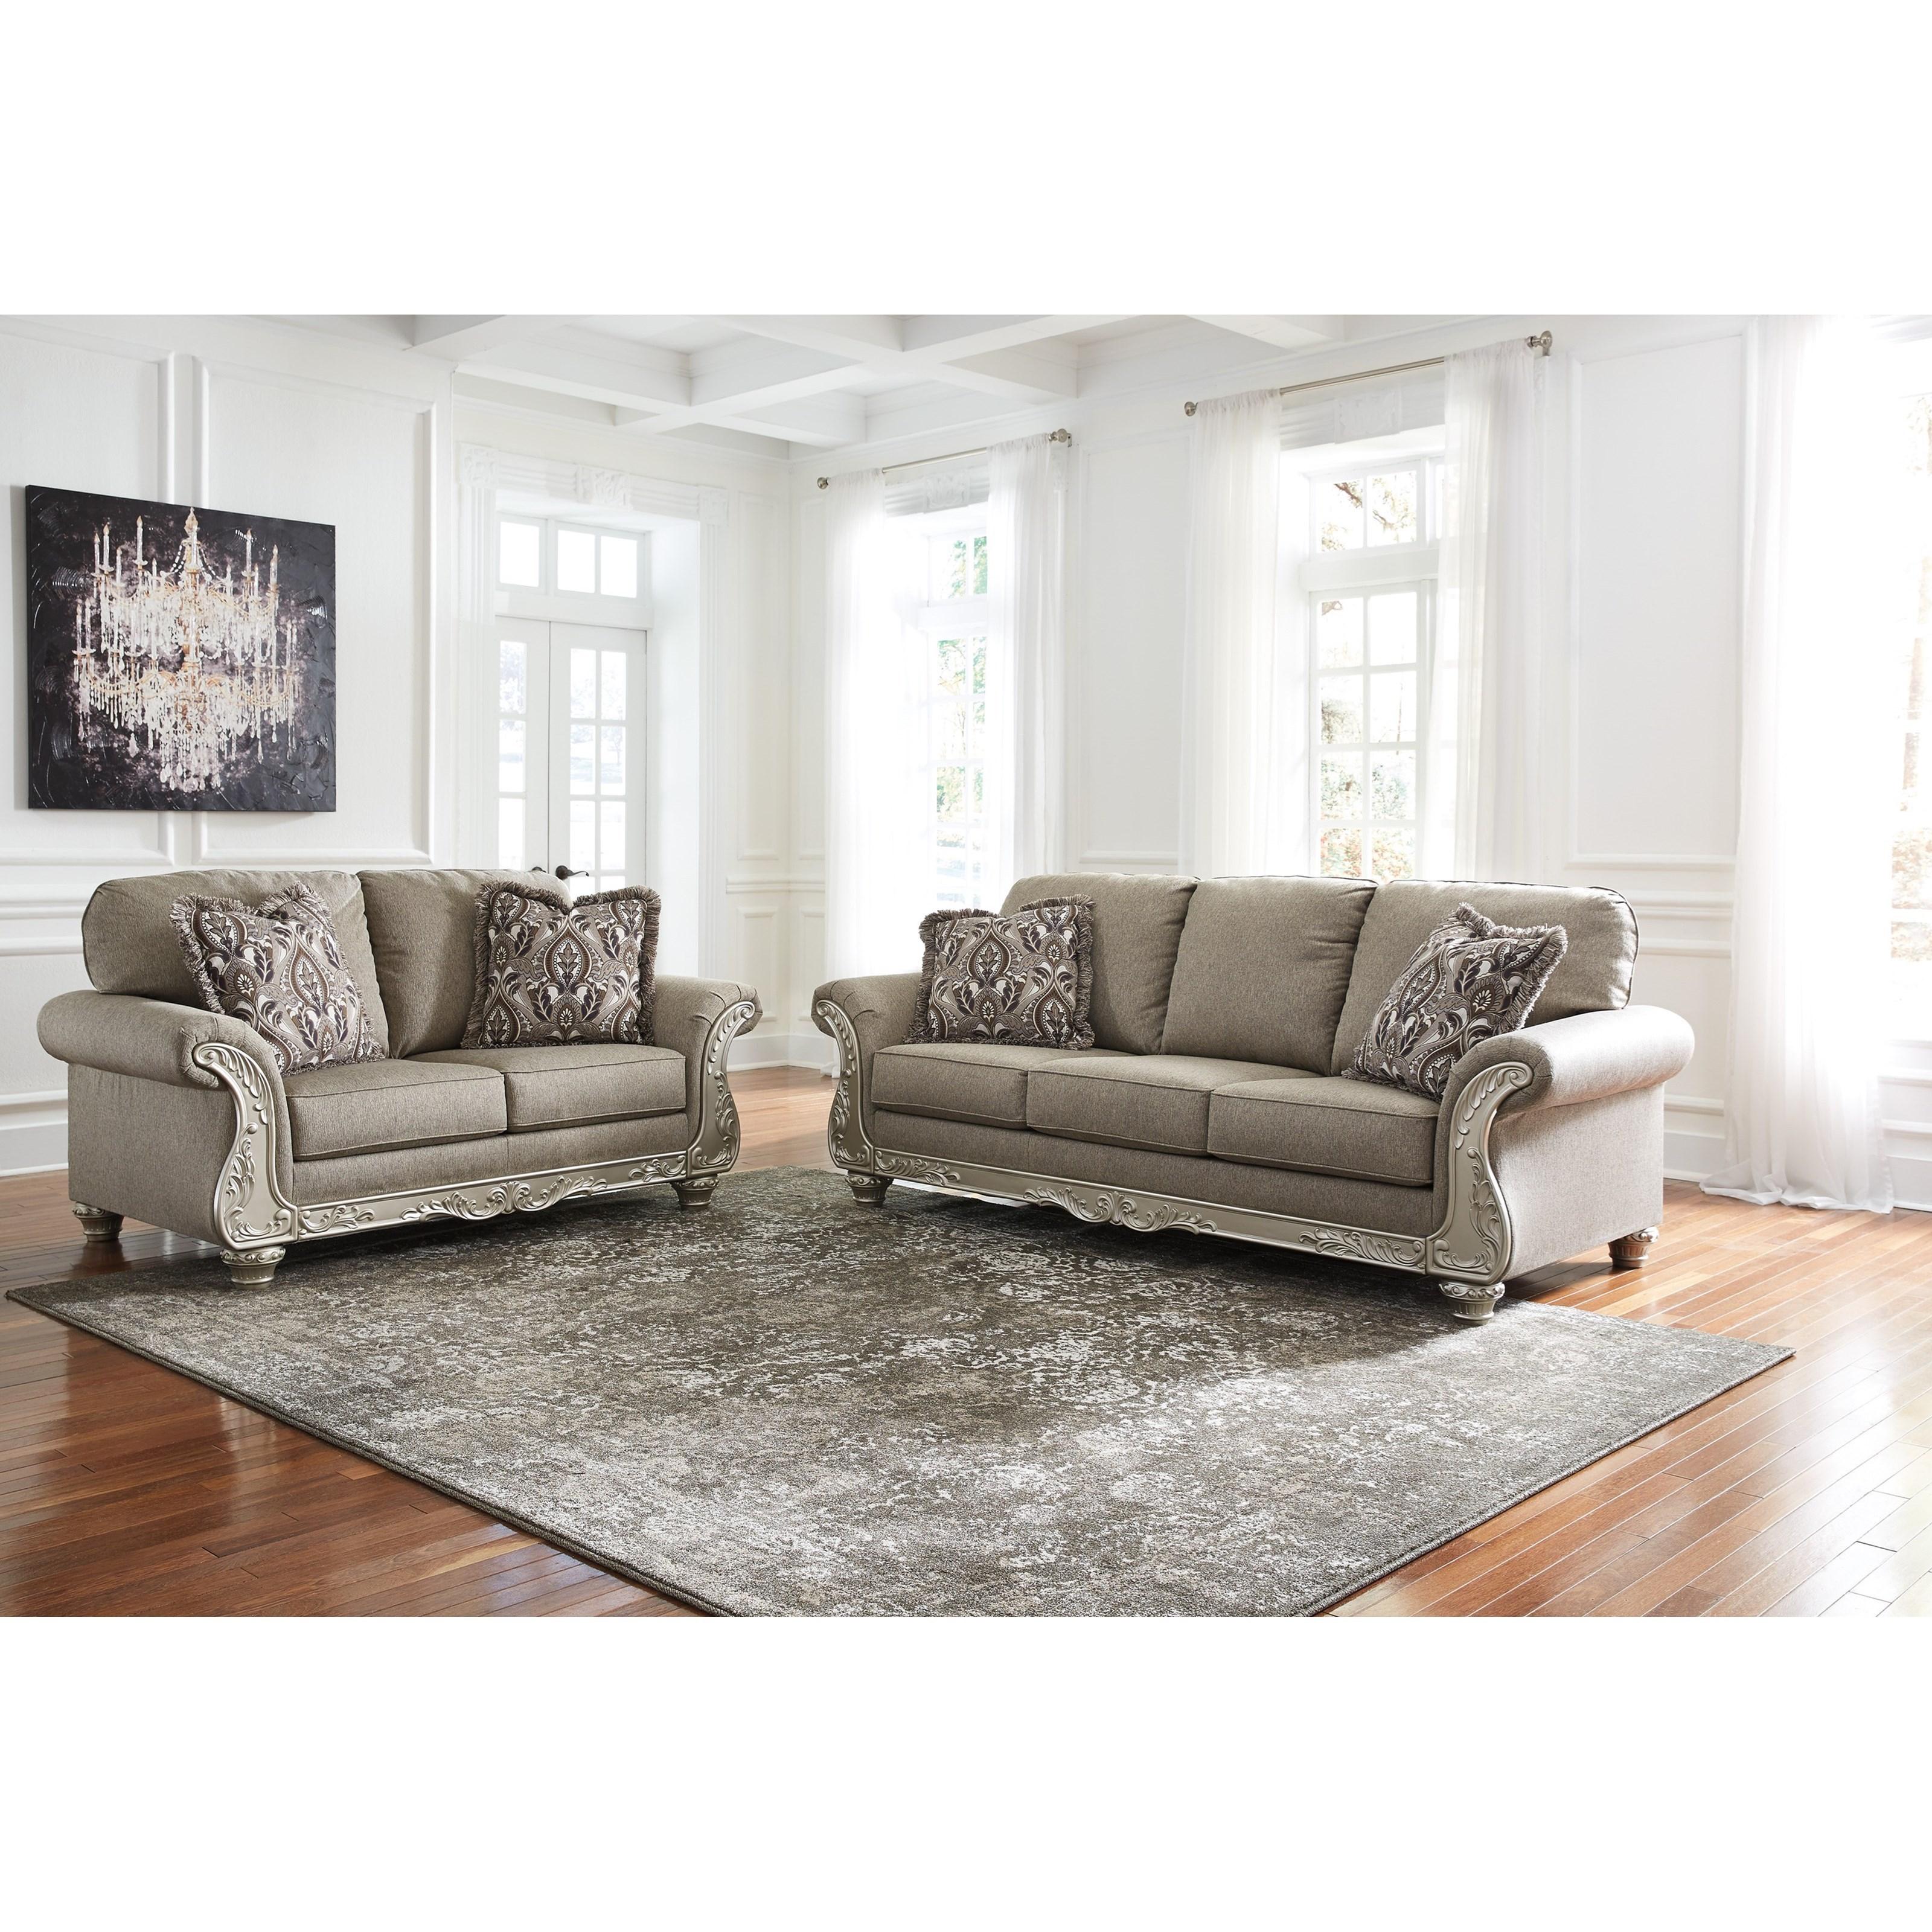 Captivating Signature Design By Ashley Gailian Stationary Living Room Group